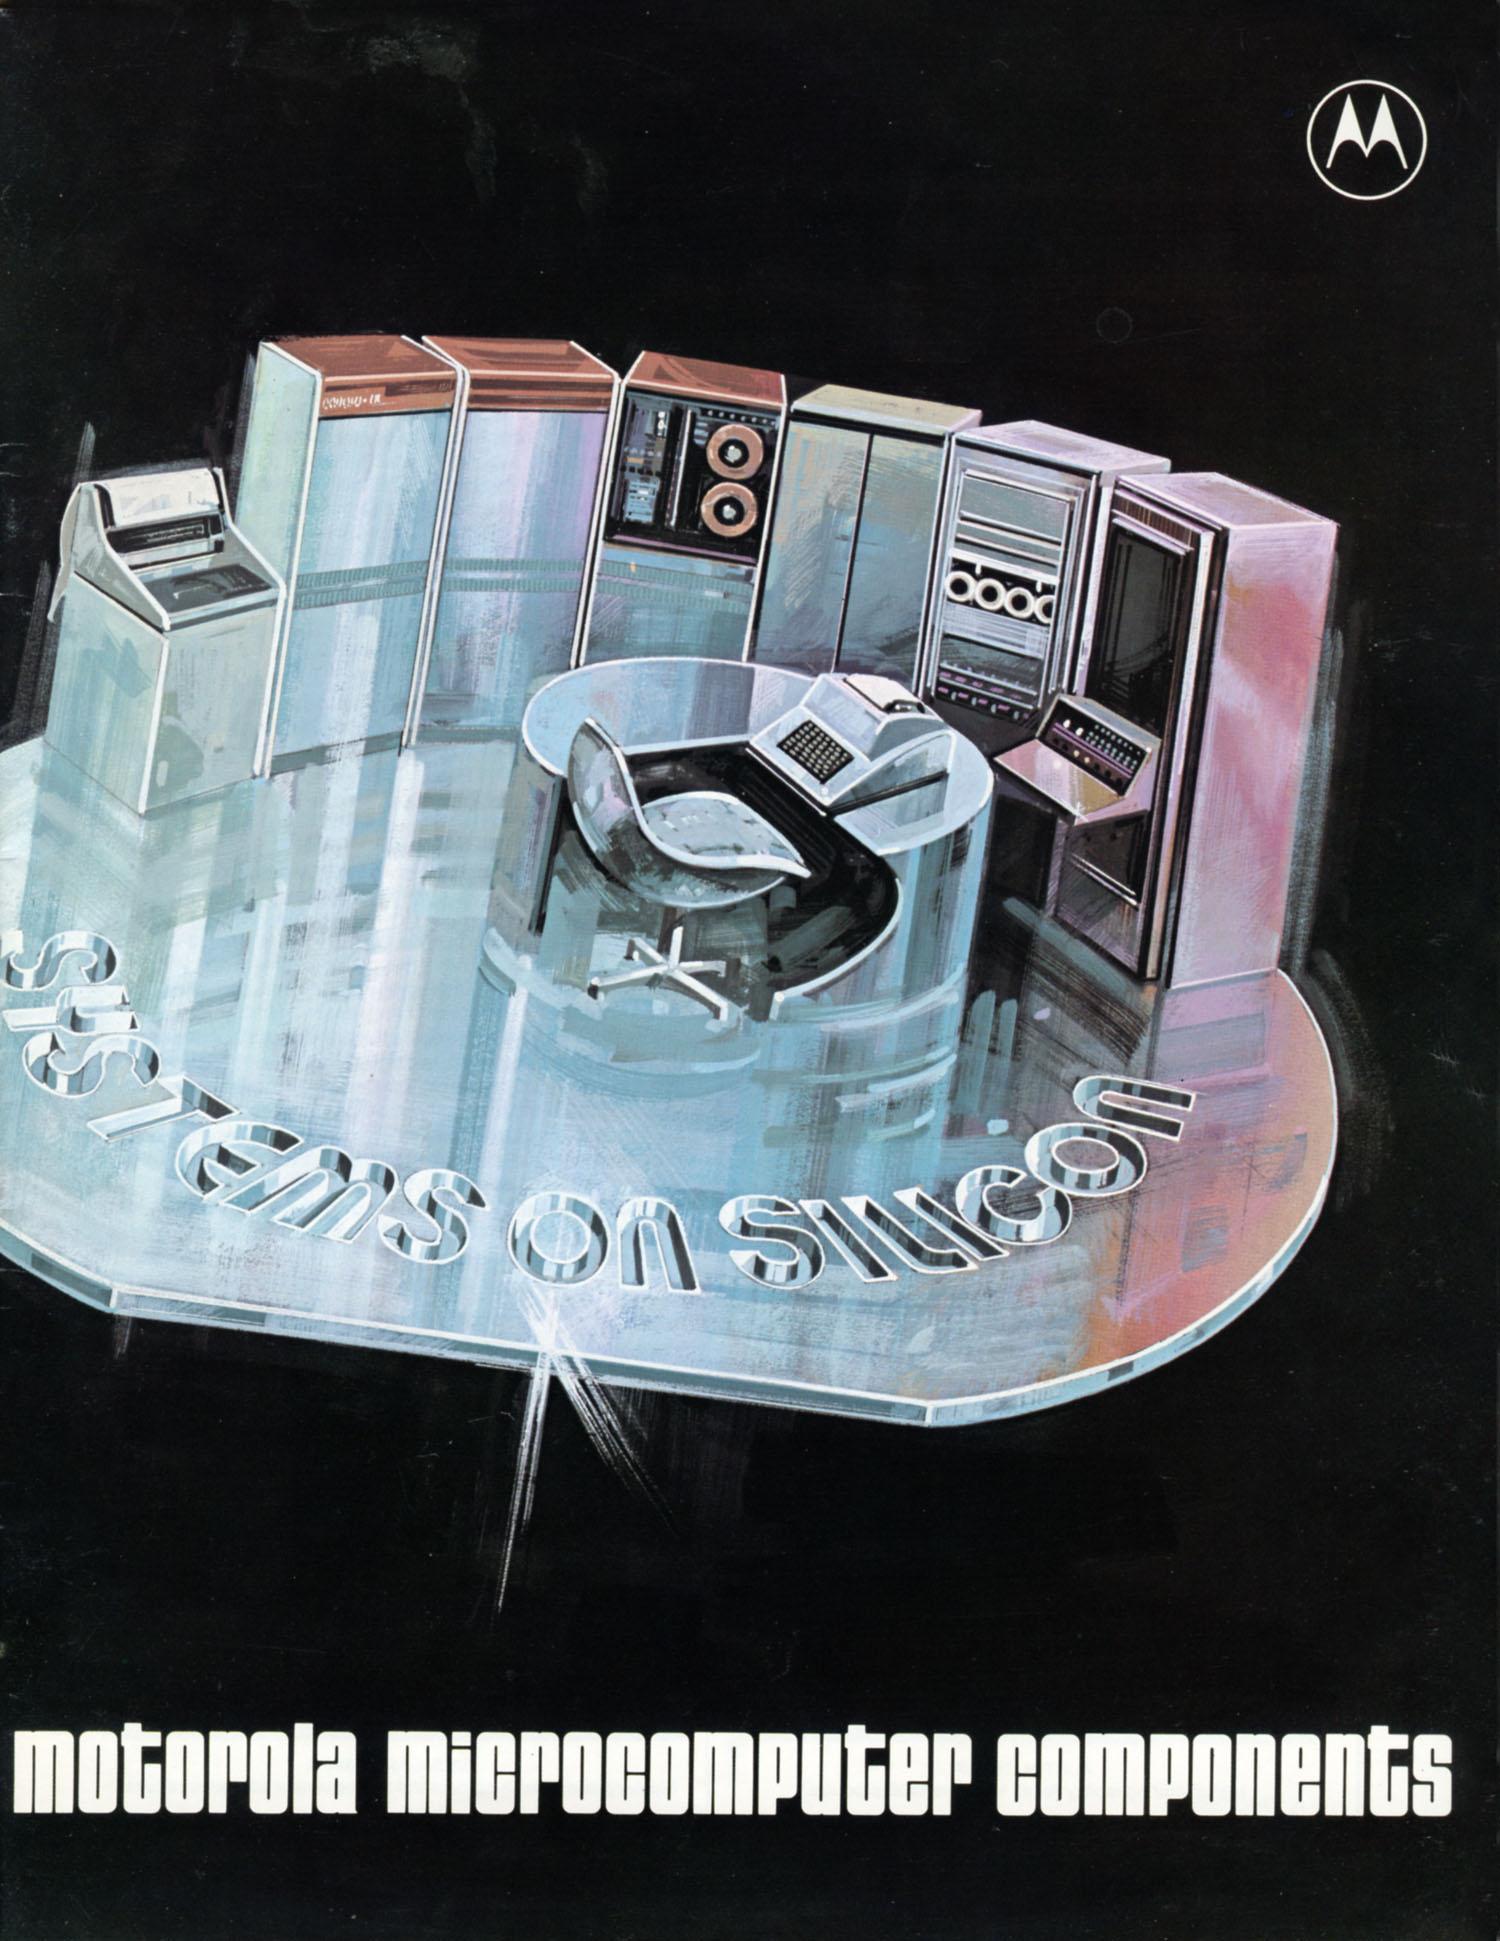 File:Motorola Microcomputer Components 1978 pg01.jpg - Wikimedia Commons